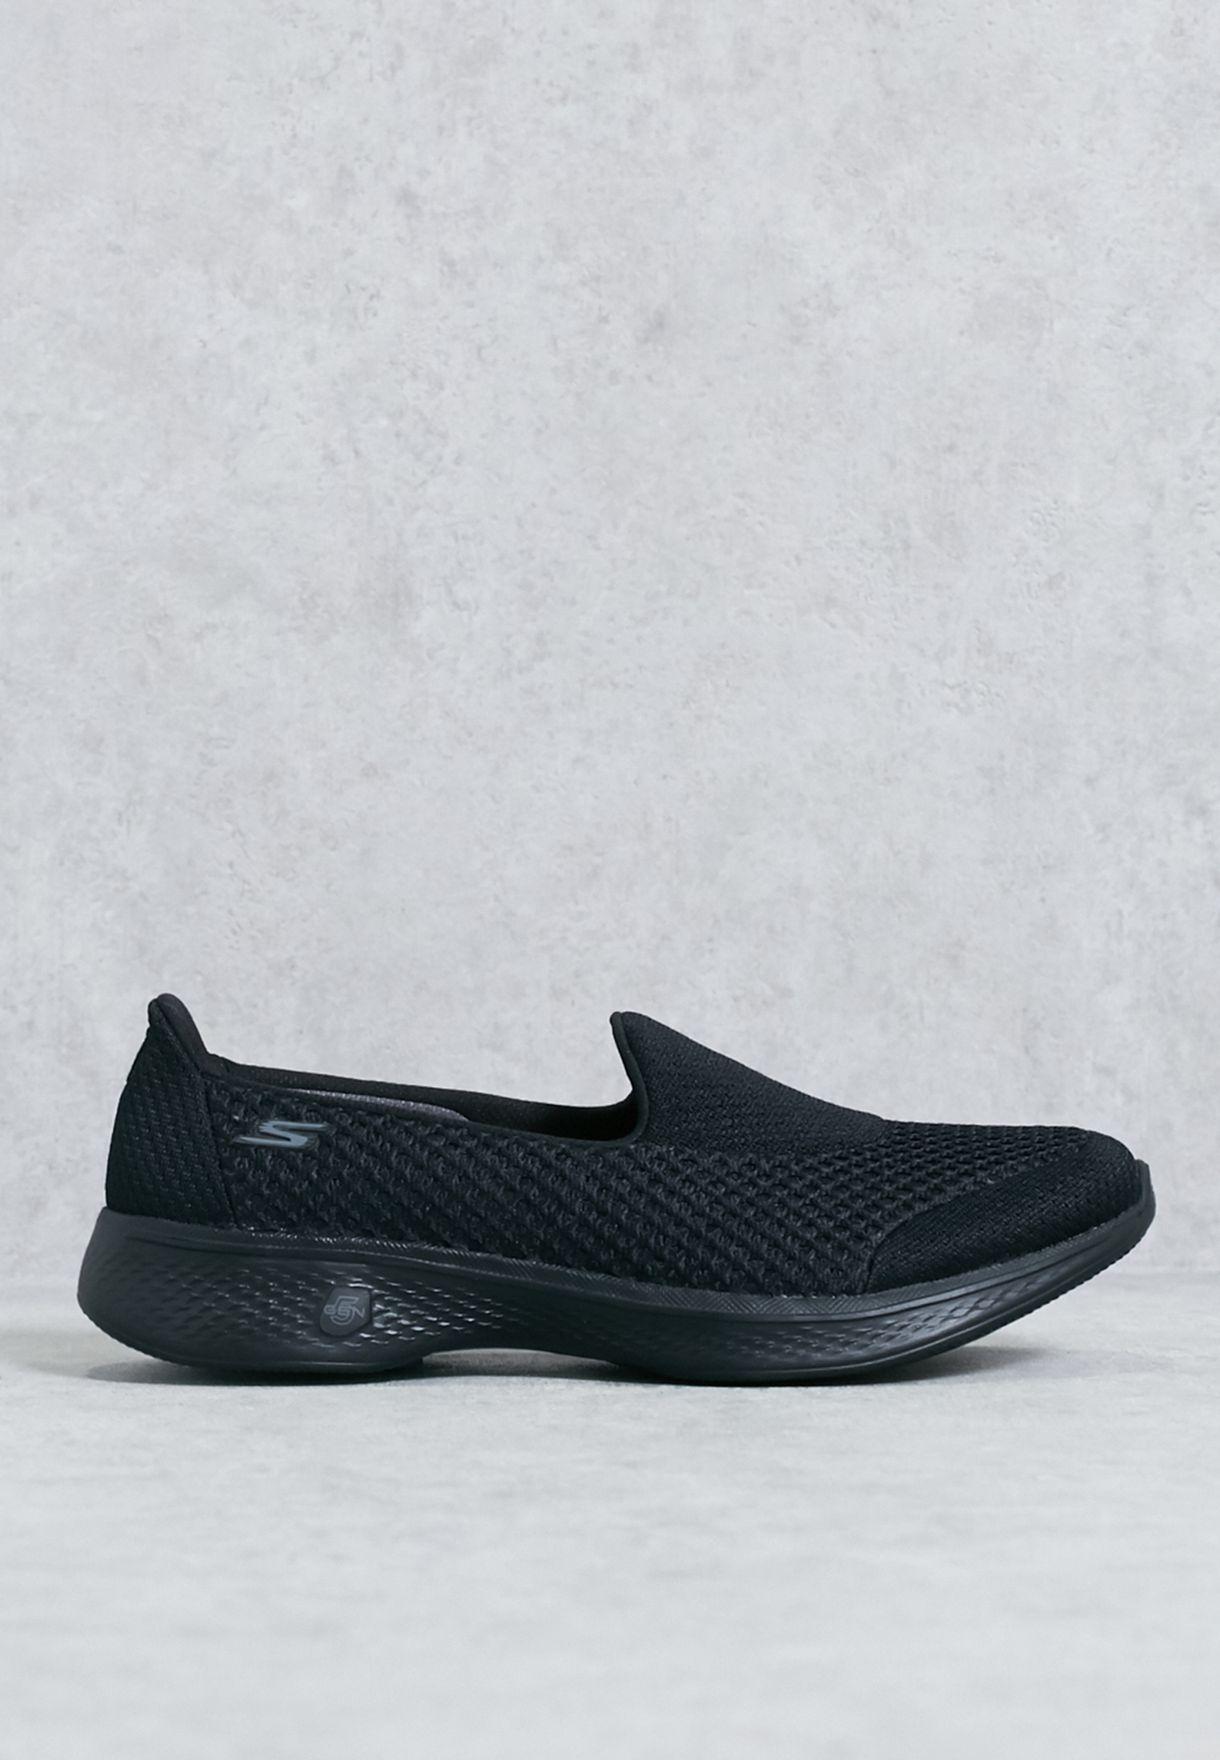 8d09d2a29564 Shop Skechers black Go Walk 4 Kindle Comfort Shoes 14145-BBK for ...